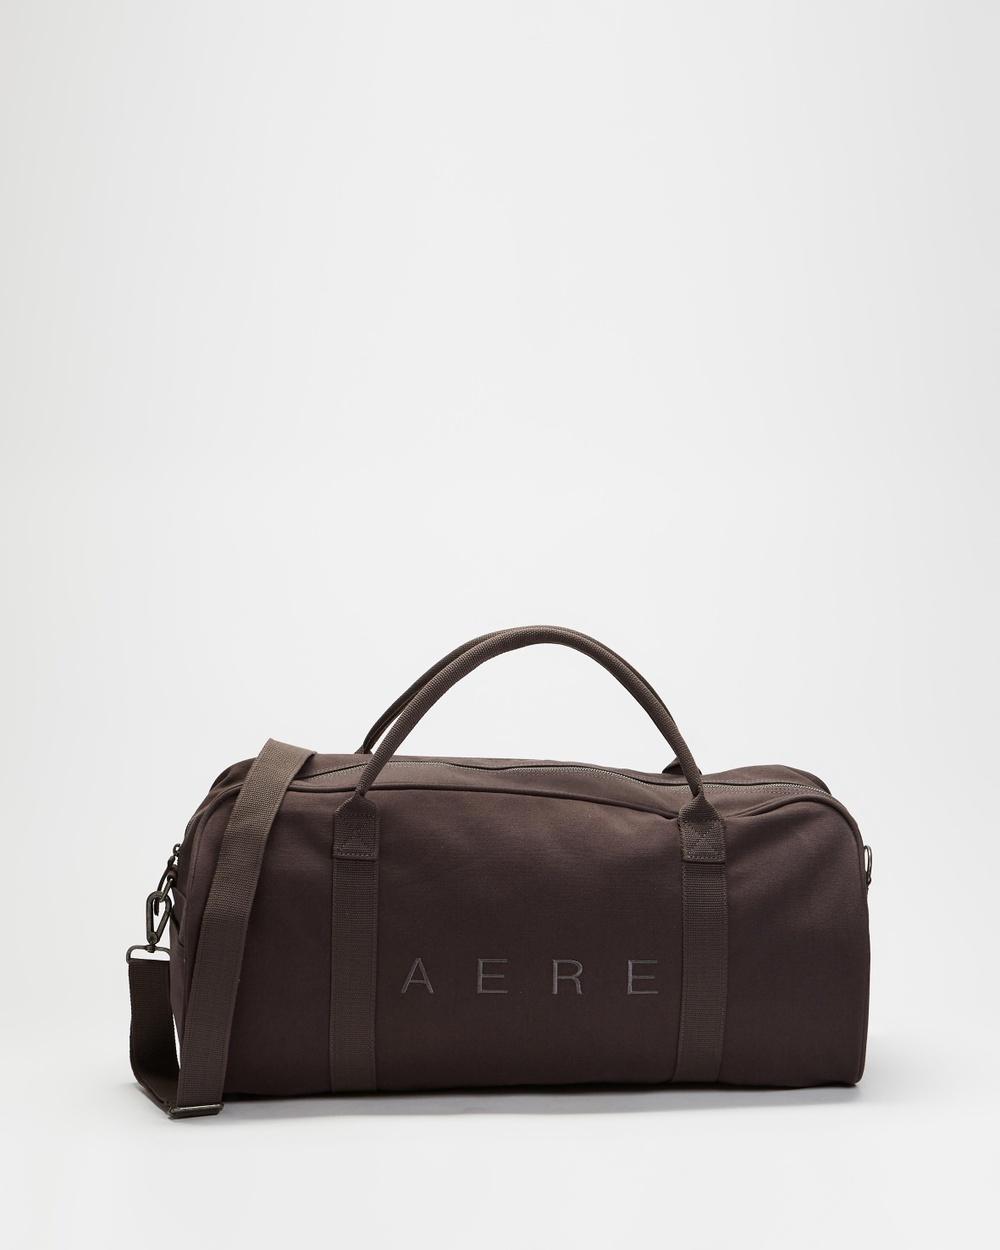 AERE Organic Canvas Weekender Duffle Bags Charcoal Black